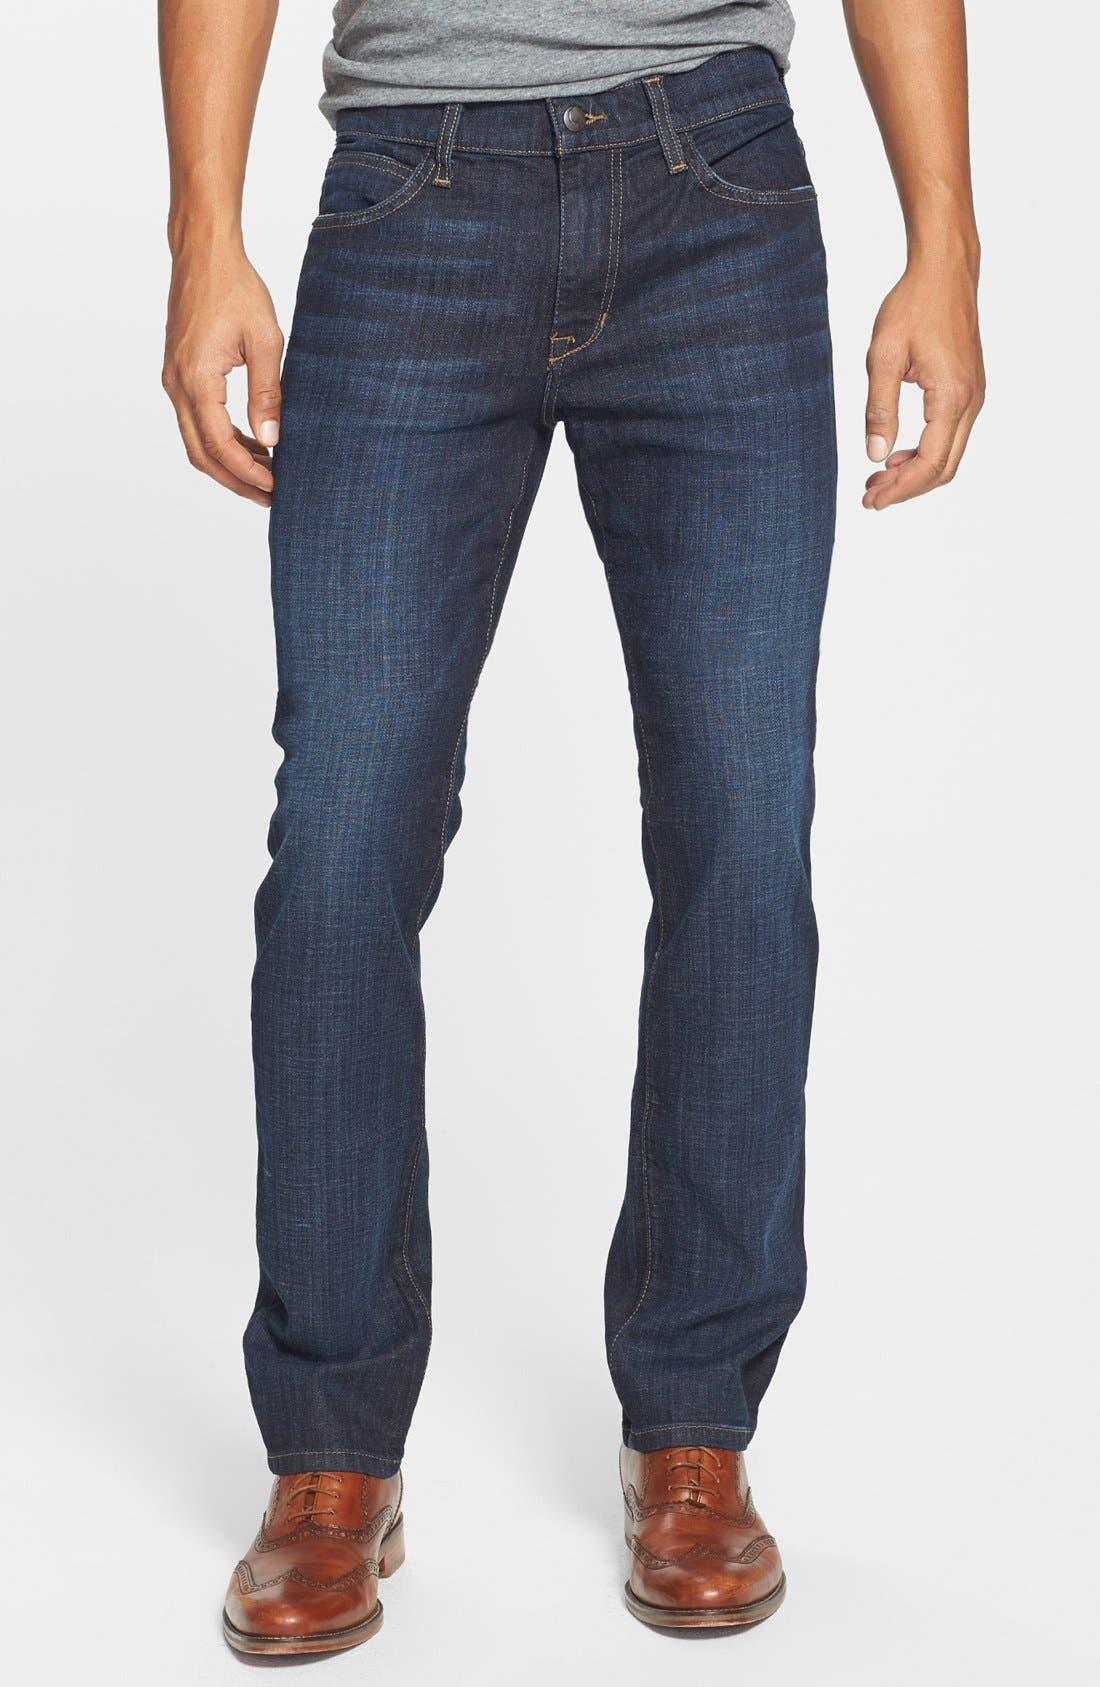 Alternate Image 1 Selected - Joe's 'Slim' Skinny Fit Jeans (Hunter)